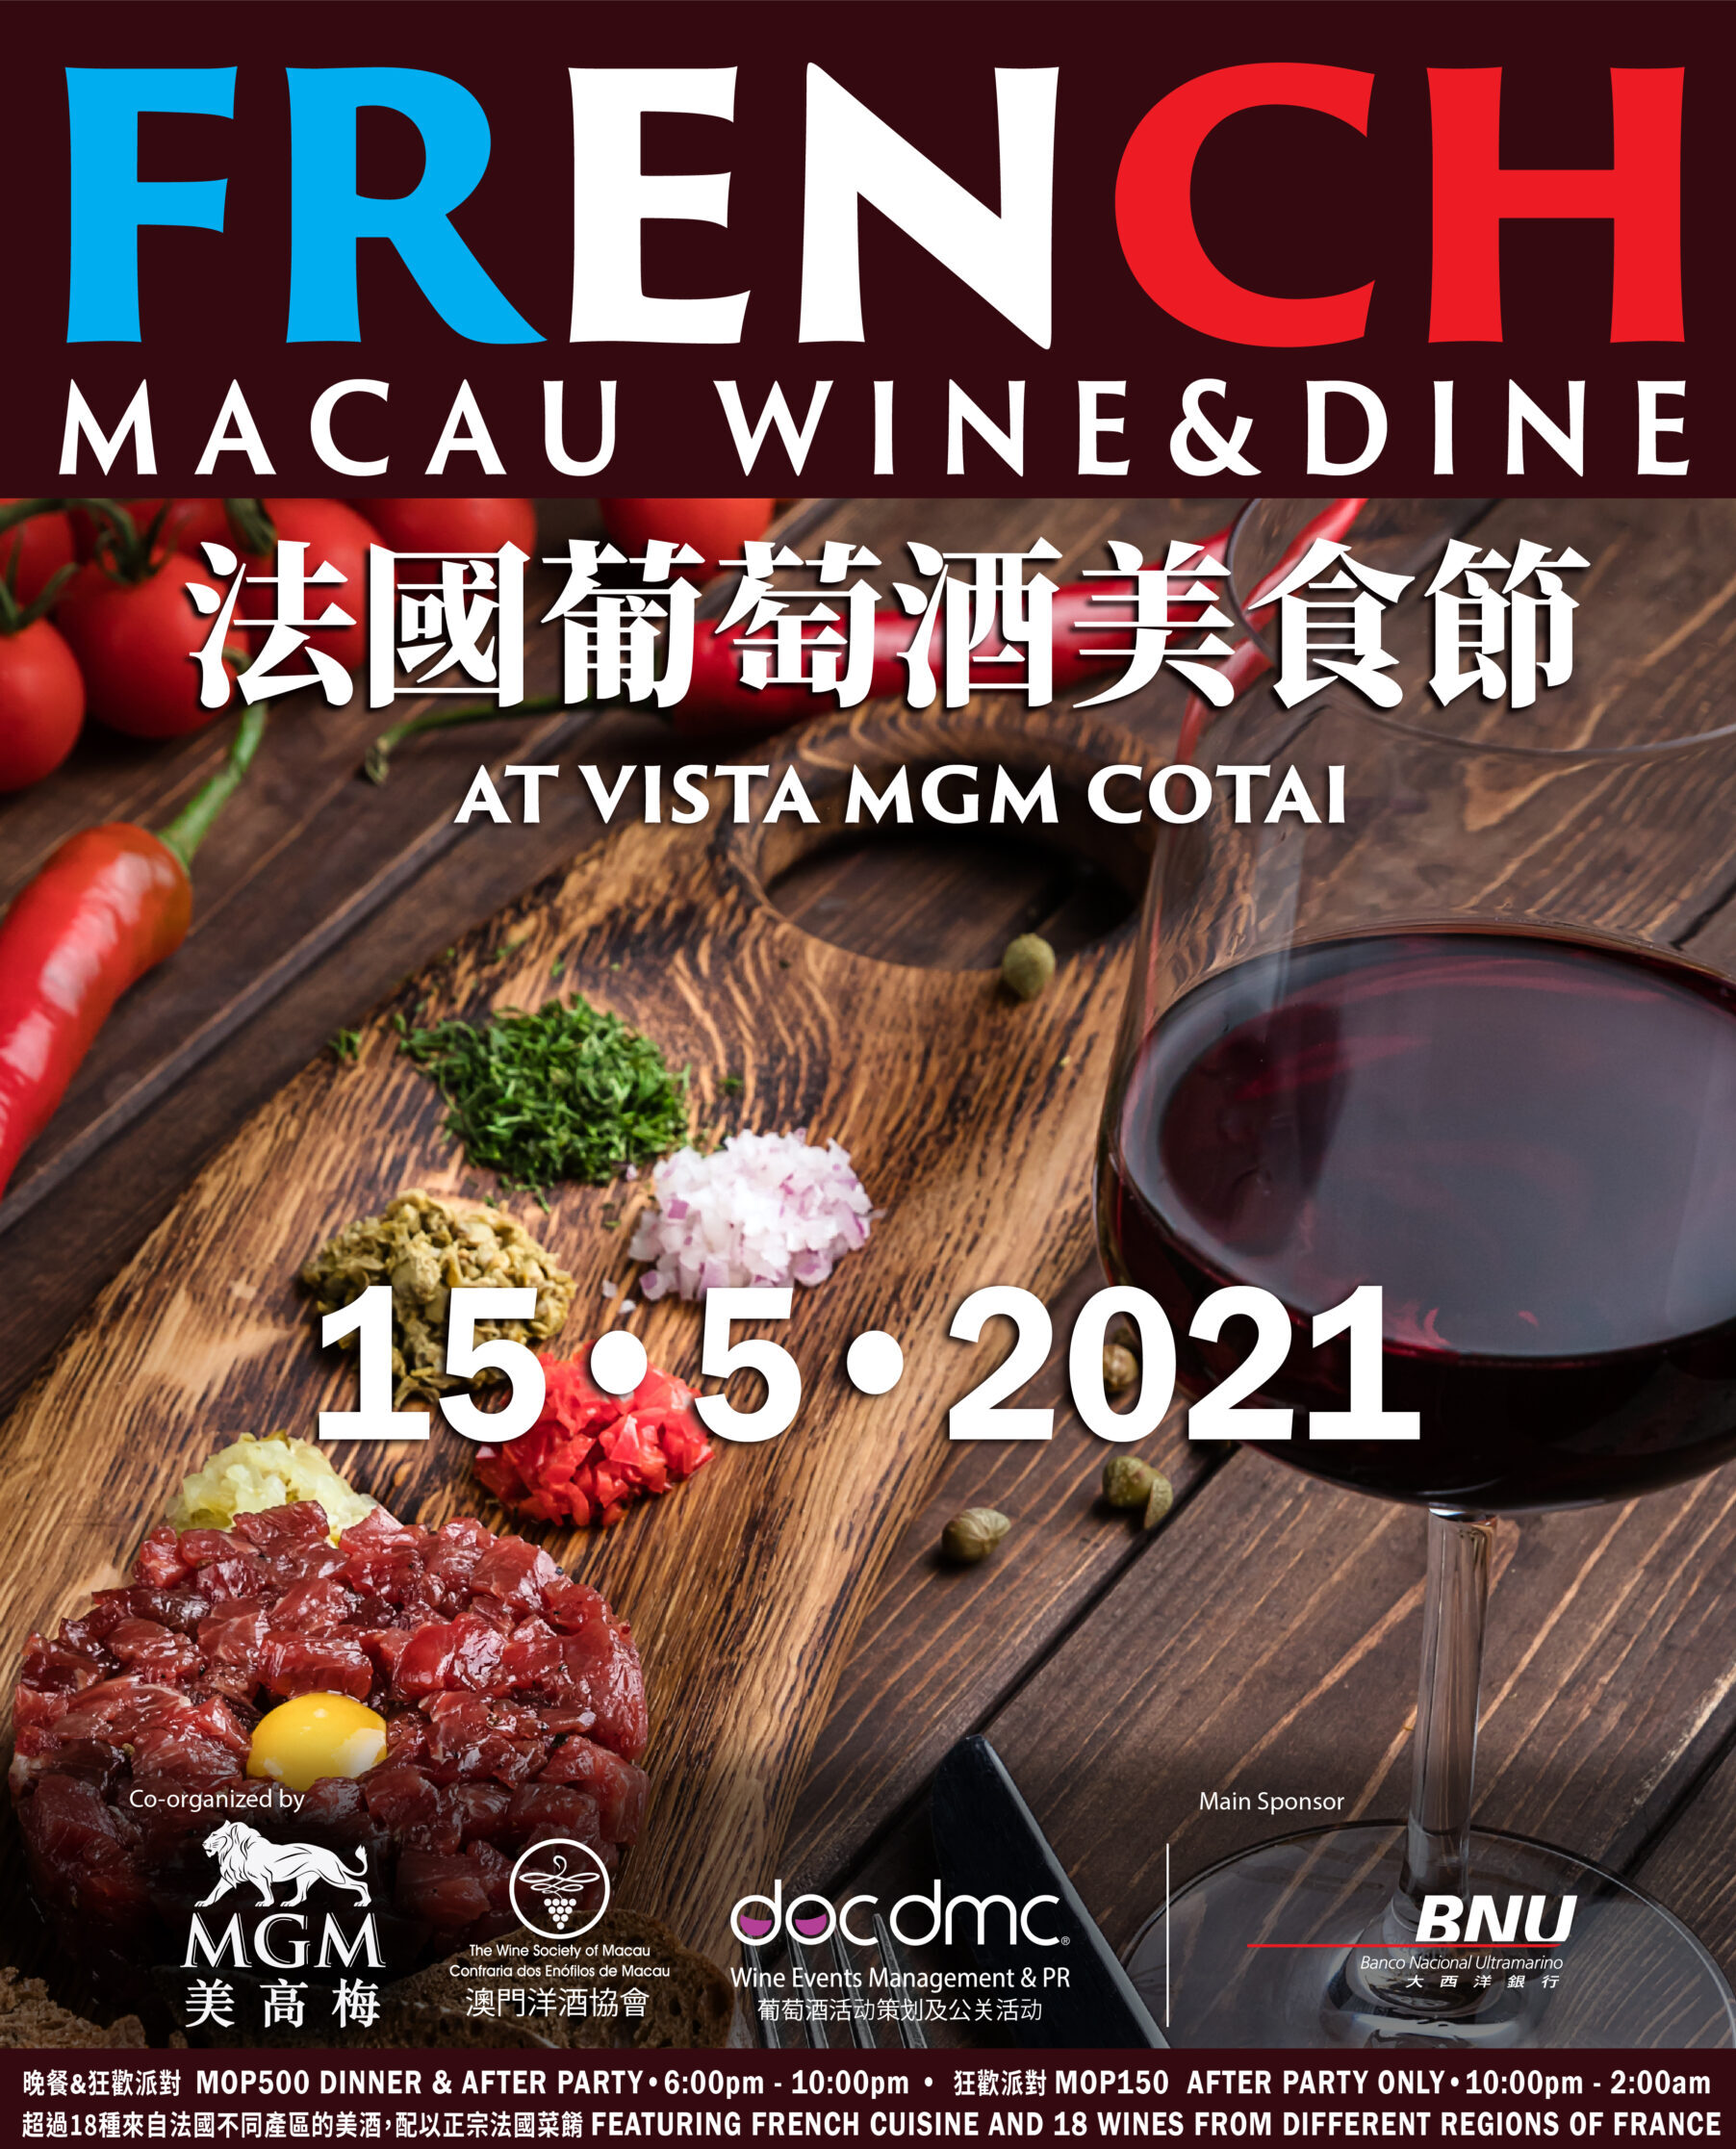 French Wine & Dine, Macau Wine & Dine events